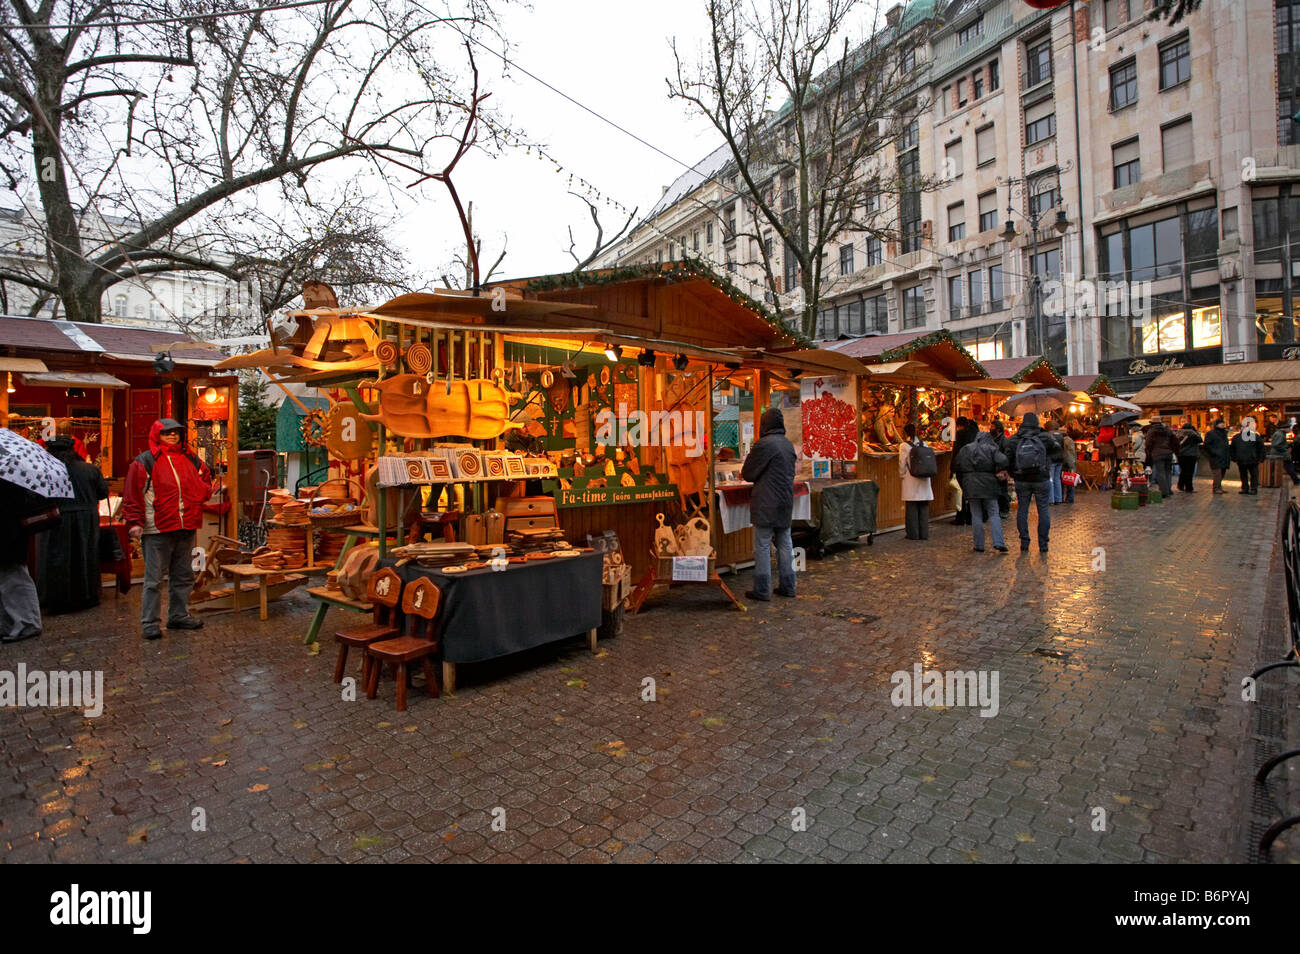 Vorosmarty Square Budapest Christmas Market.Hungary Budapest Christmas Market Vorosmarty Square Stock